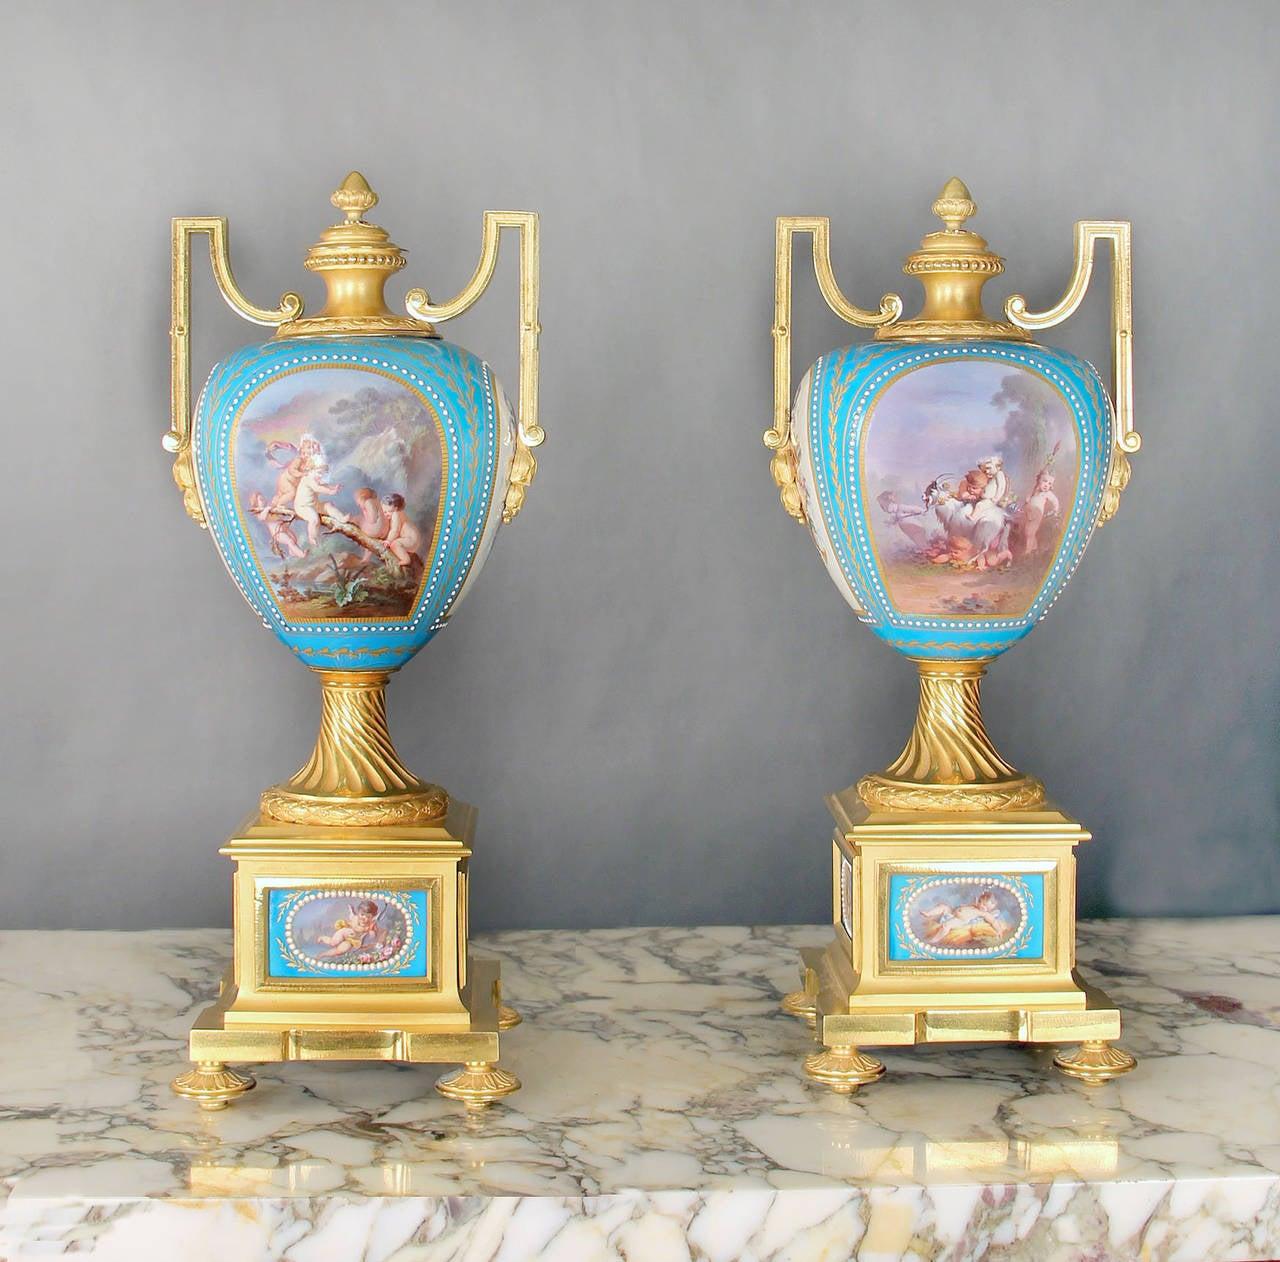 Gilt Sèvres Porcelain 'Jeweled' Three-Piece Clock Set by Raingo Frères For Sale